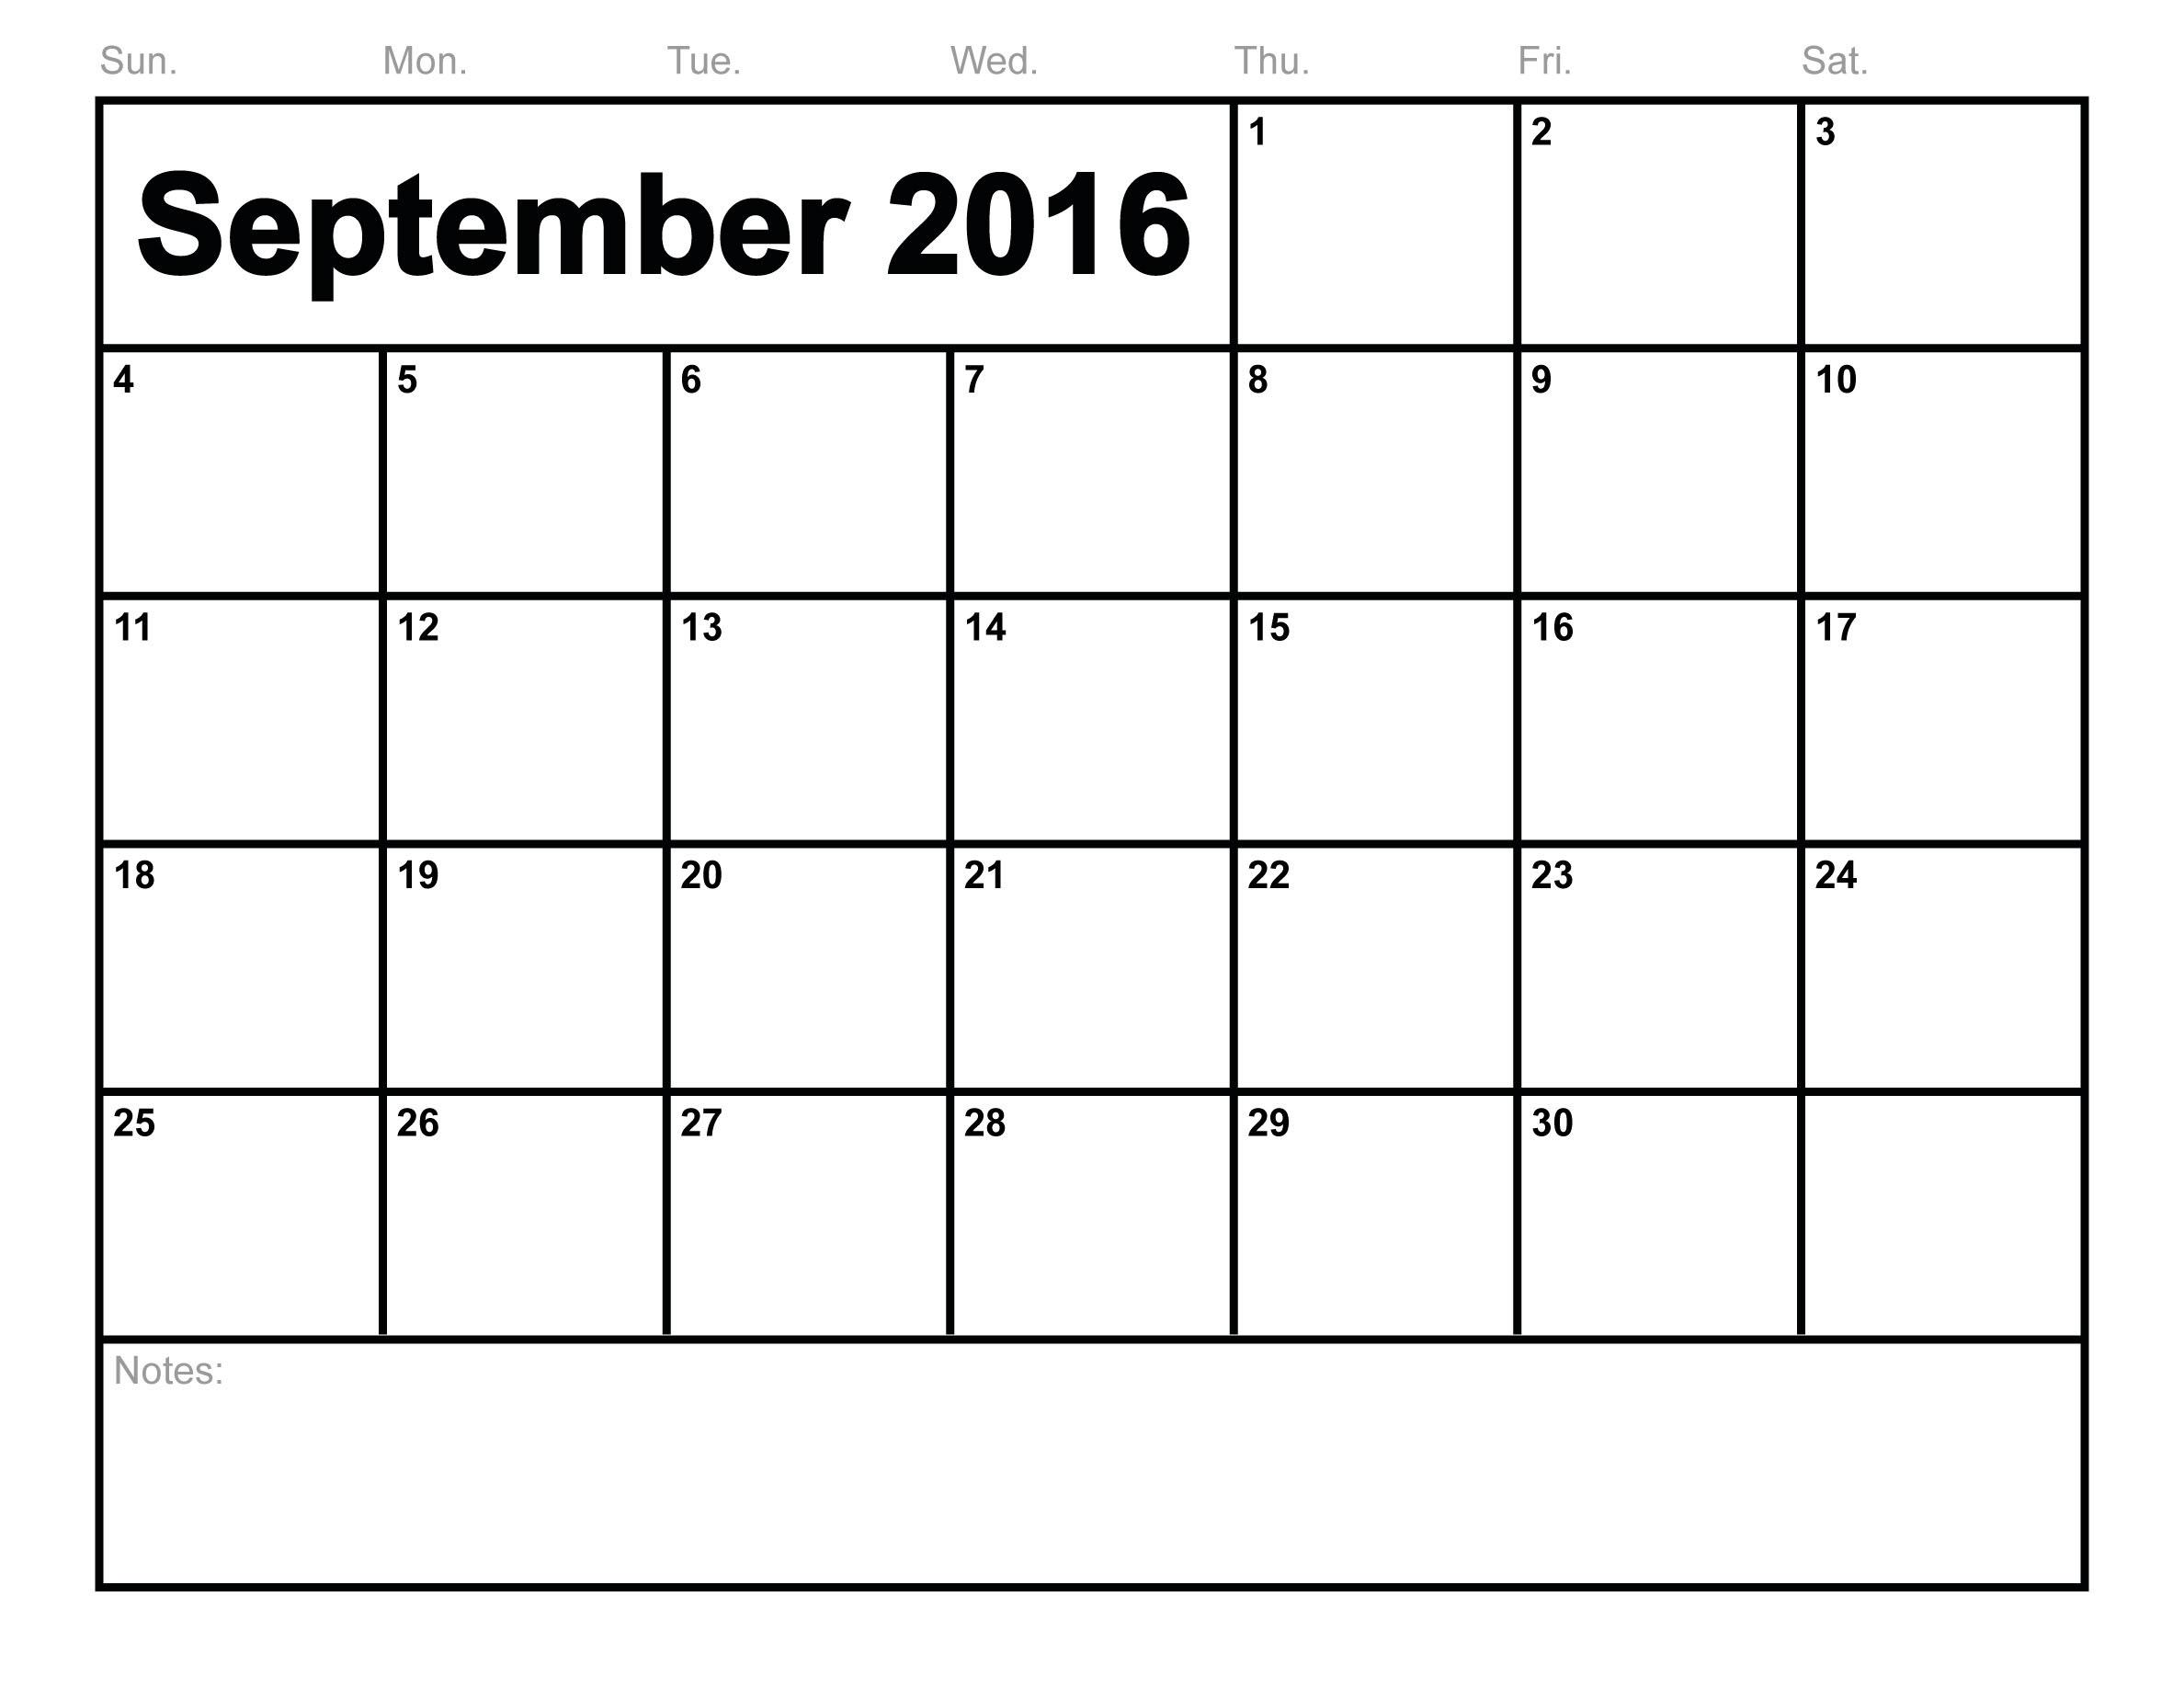 2018 September Printable Calendar Free, Blank Templates Pdf for December Blank Monthly Calendar